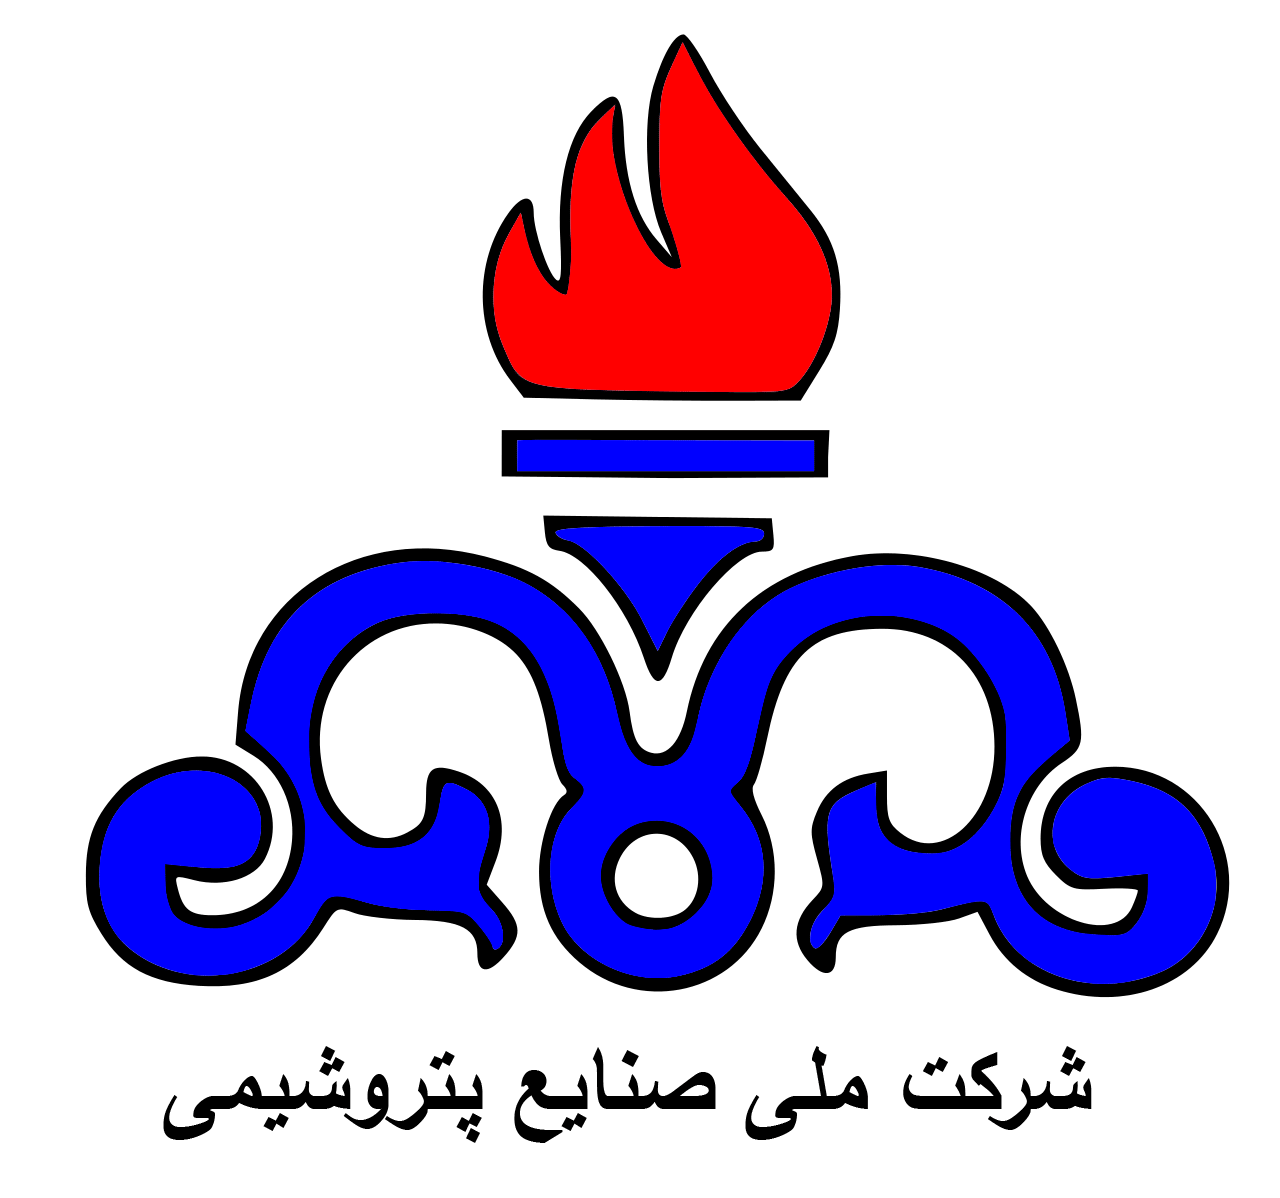 http://www.taliran.com/wp-content/uploads/2018/05/petroshimiiii.png